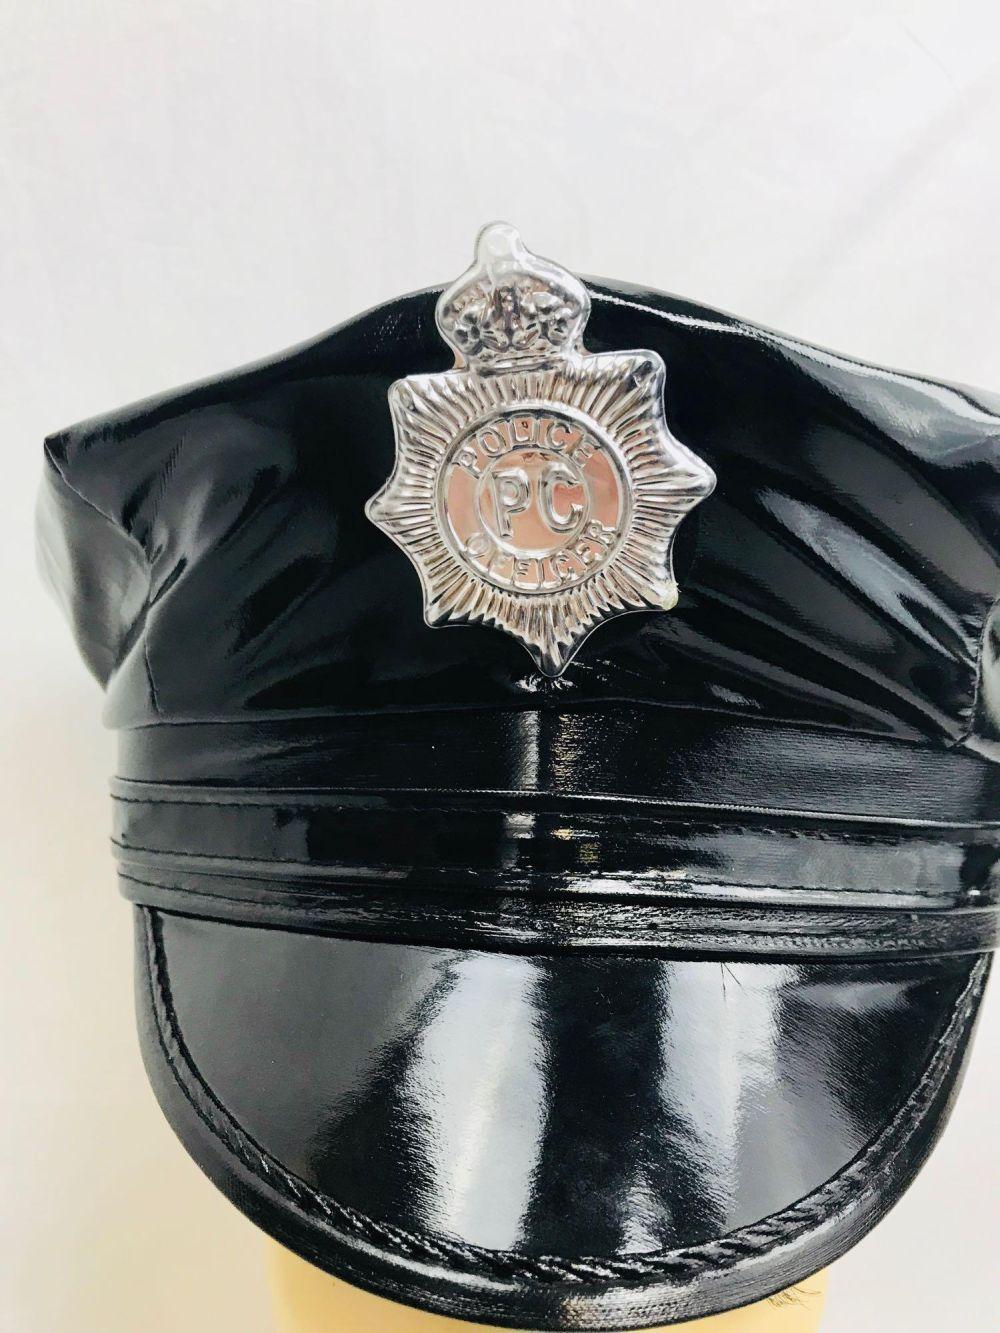 Lot 1001: Women's Vinyl Cop Hat Halloween Costume Accessory for Cosplay - Leg Avenue